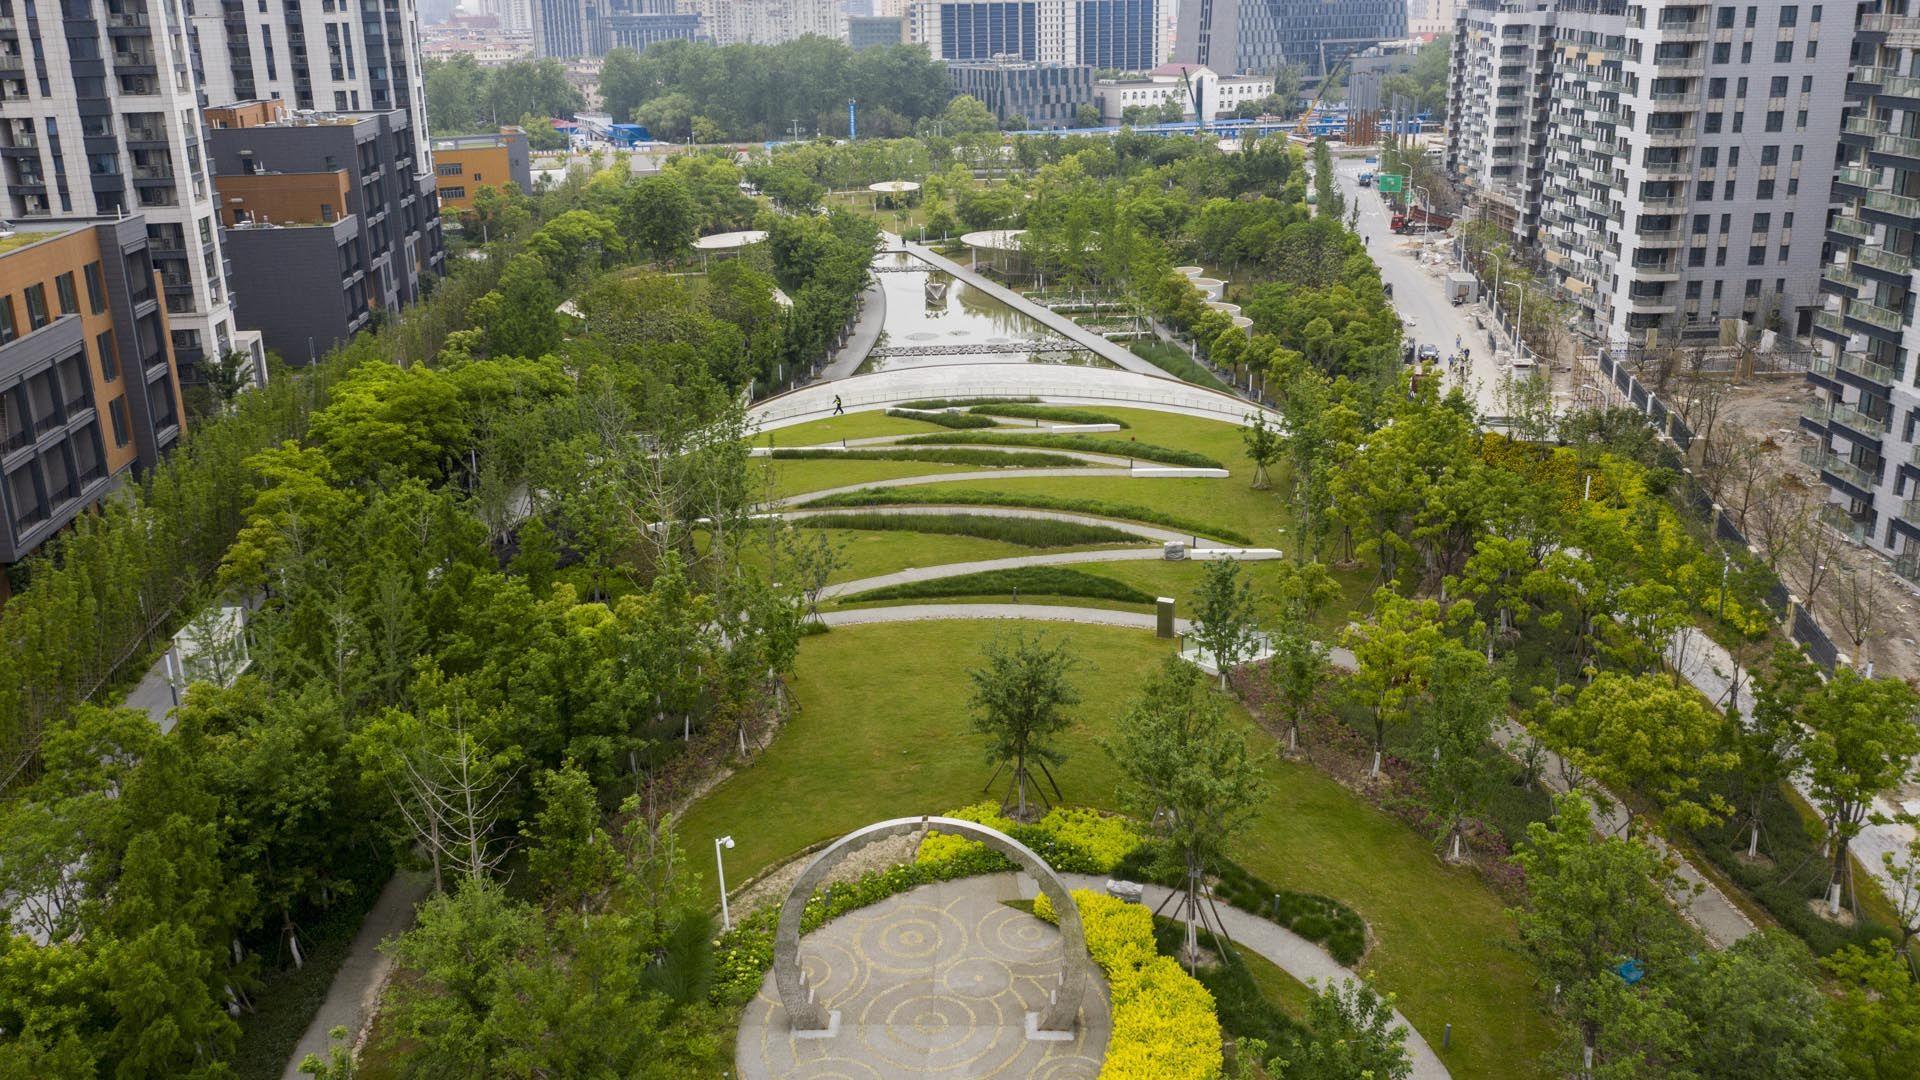 Baoshan Spig Park Swabalsley David Lloyd 0518 In 2020 Harbor City Park City Park